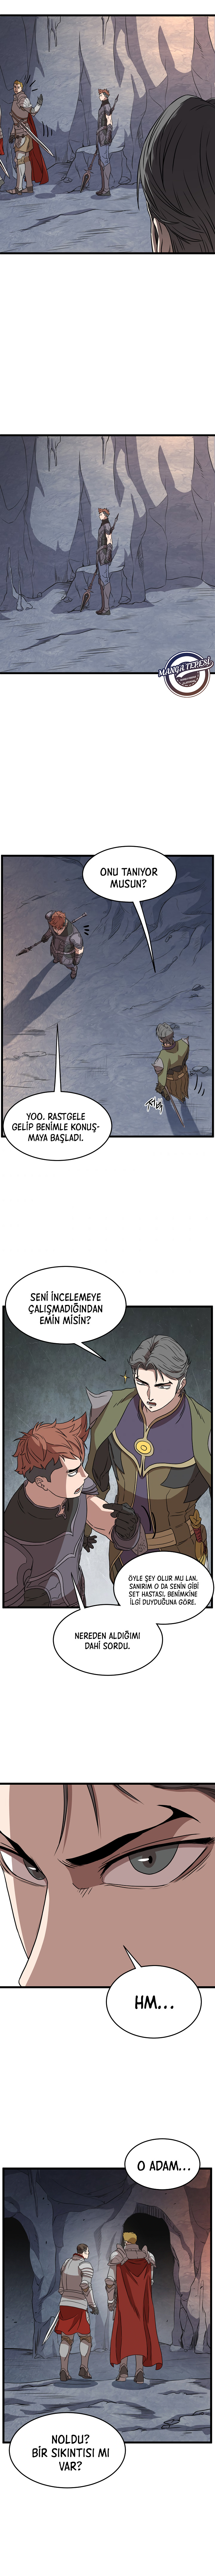 murim-login68-bolum